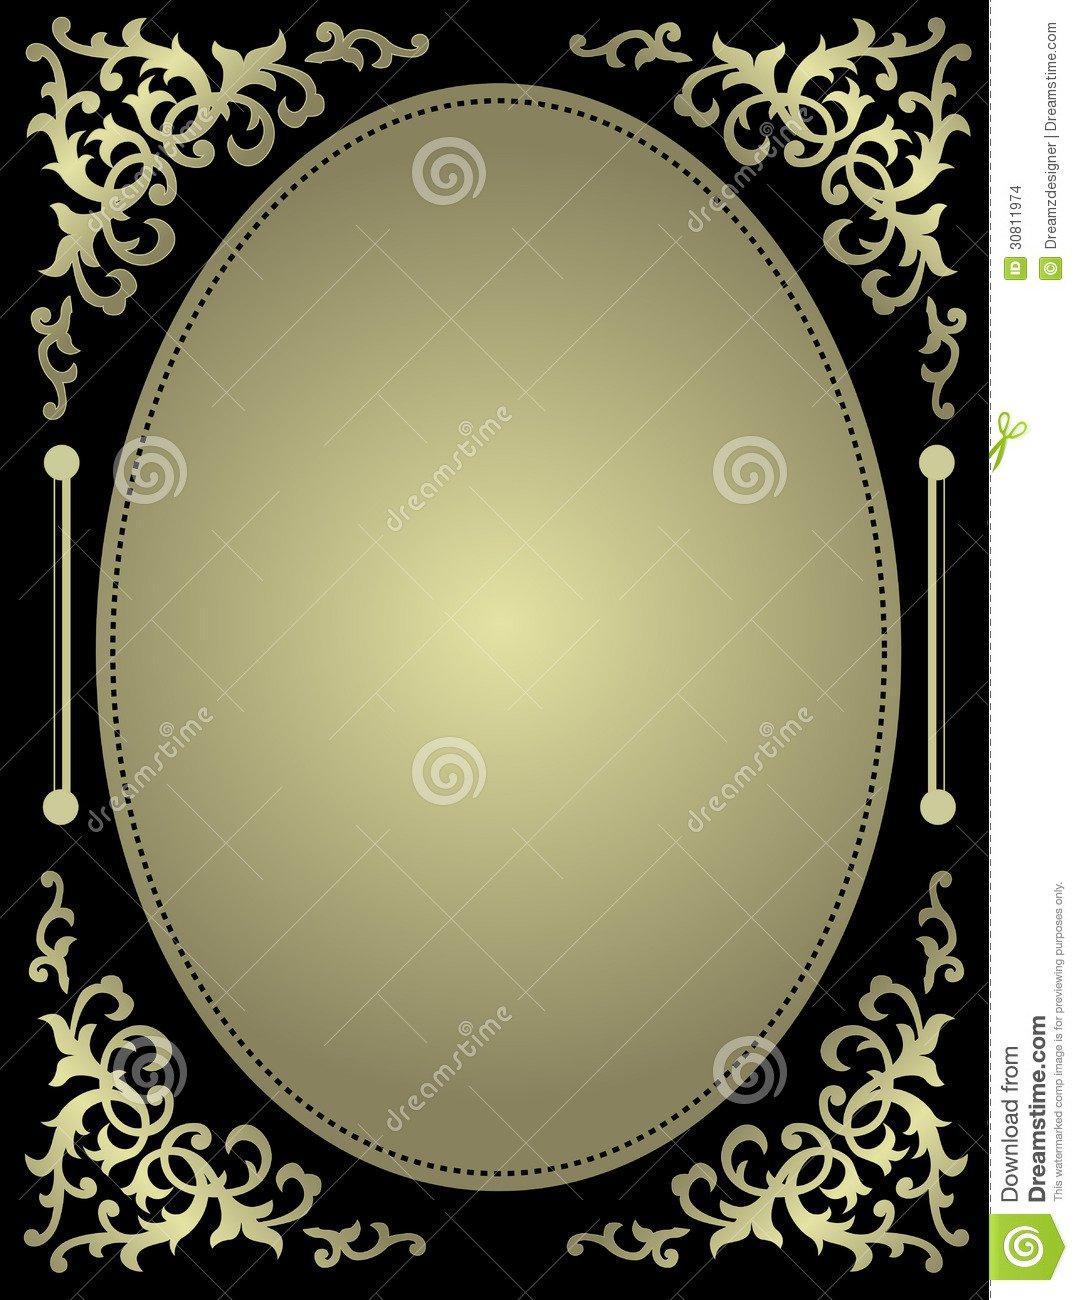 Elegant Wedding Invitation Background Designs